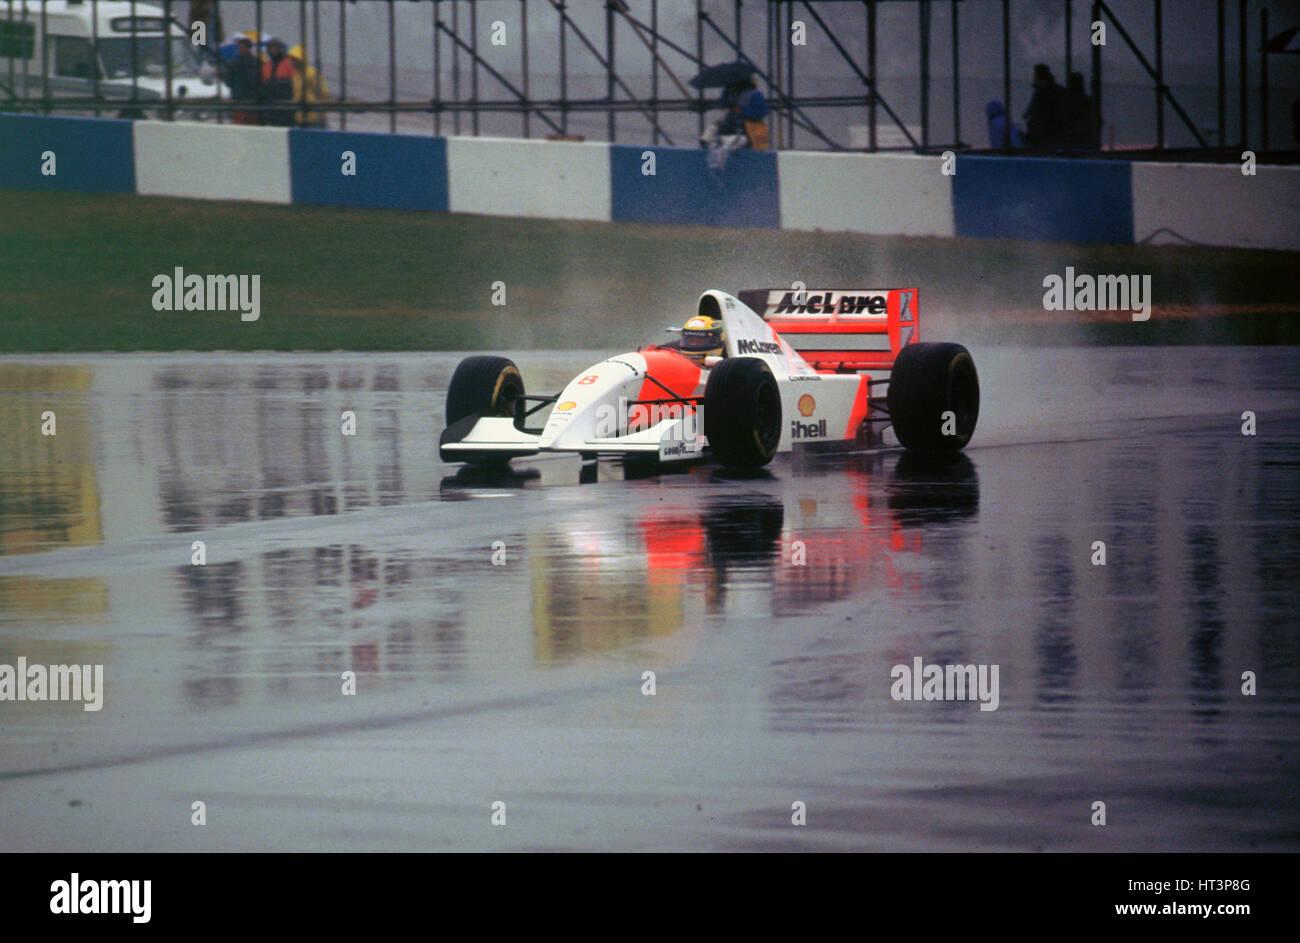 Ayrton Senna in the McLaren MP4-8 1993 European Grand Prix at Donington Artist: Unknown. - Stock Image